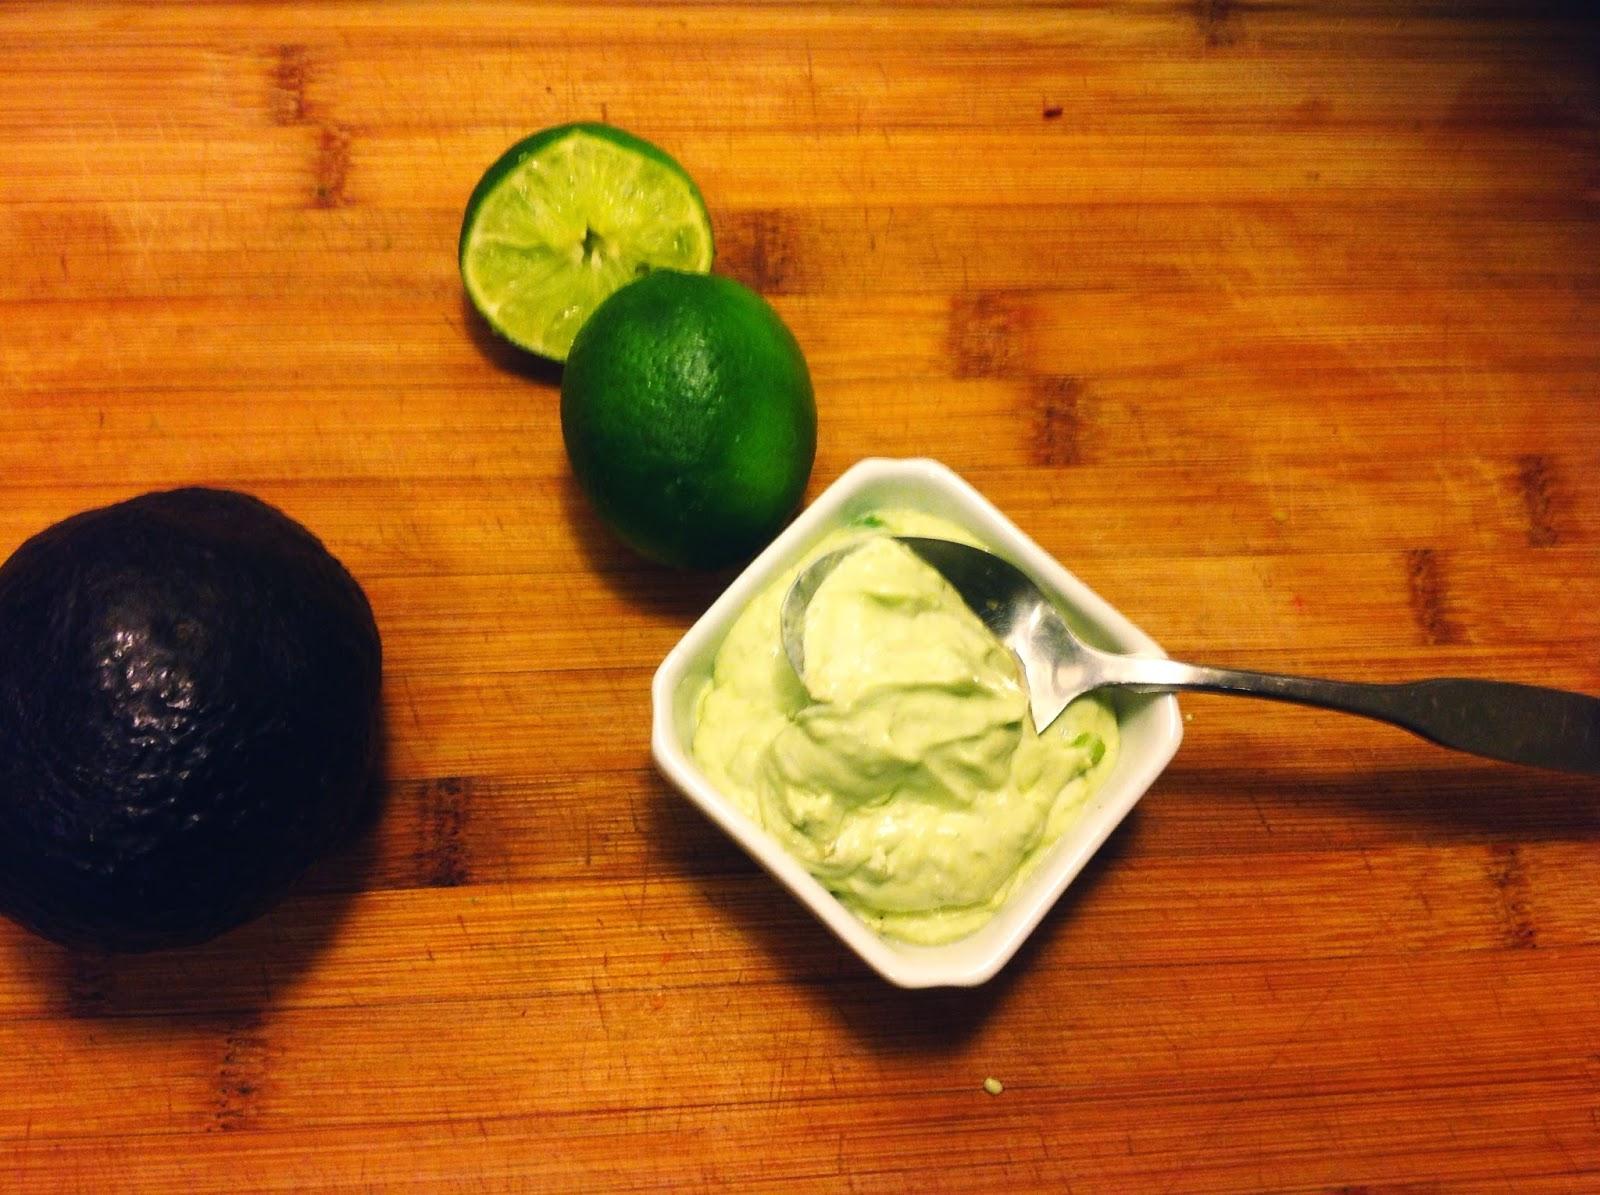 vegan texmex style stuffed butternut squash with vegan avocado crema